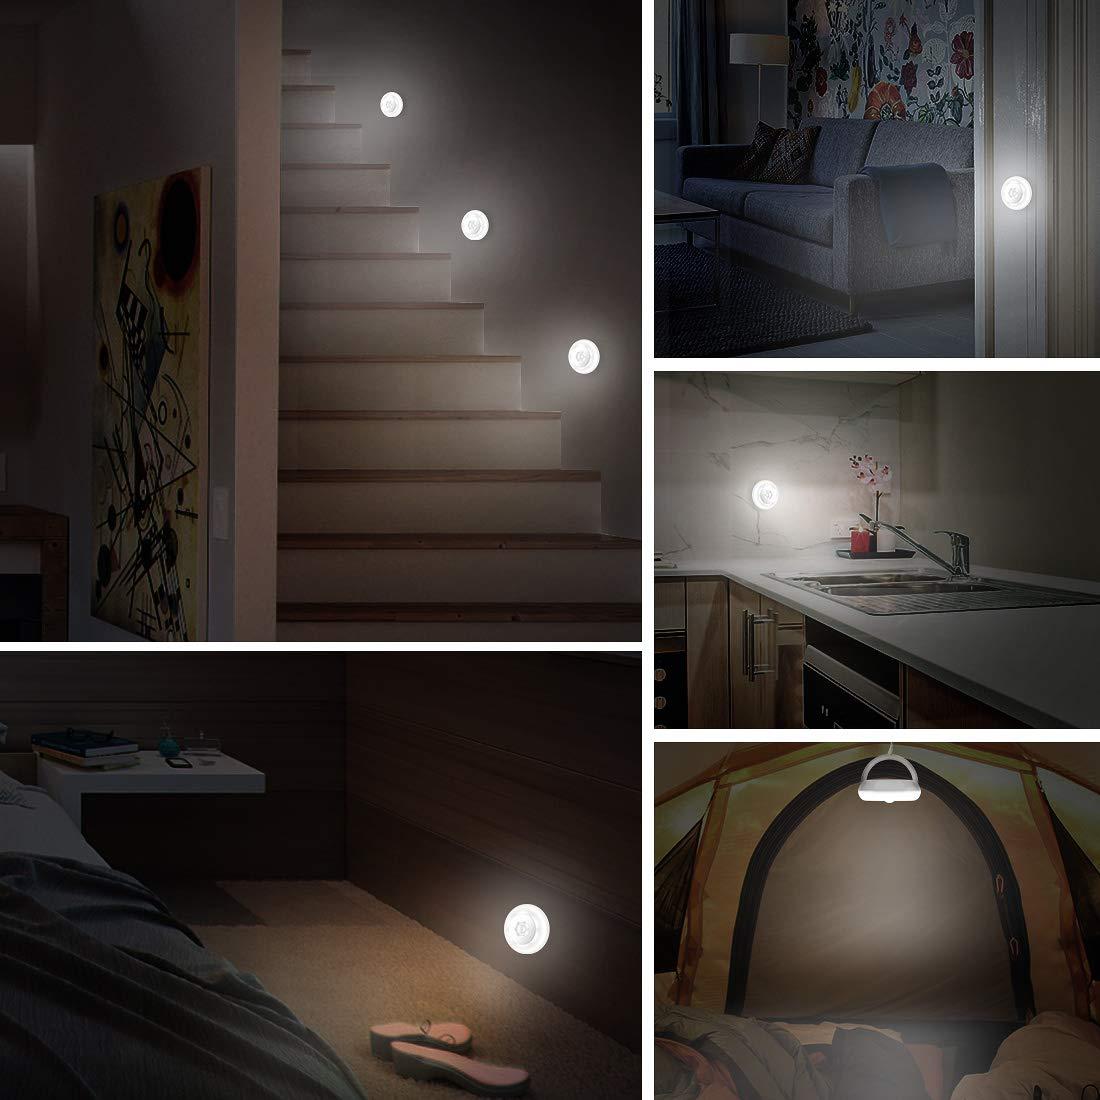 TAOCOCO Motion Sensor Night Light, Battery-Powered LED Night Lights for Kids Baby, Magnet Stick-on Stick-Anywhere Closet Light for Stair, Kitchen, Bathroom, Bedroom, Bar (2 Pack, White)